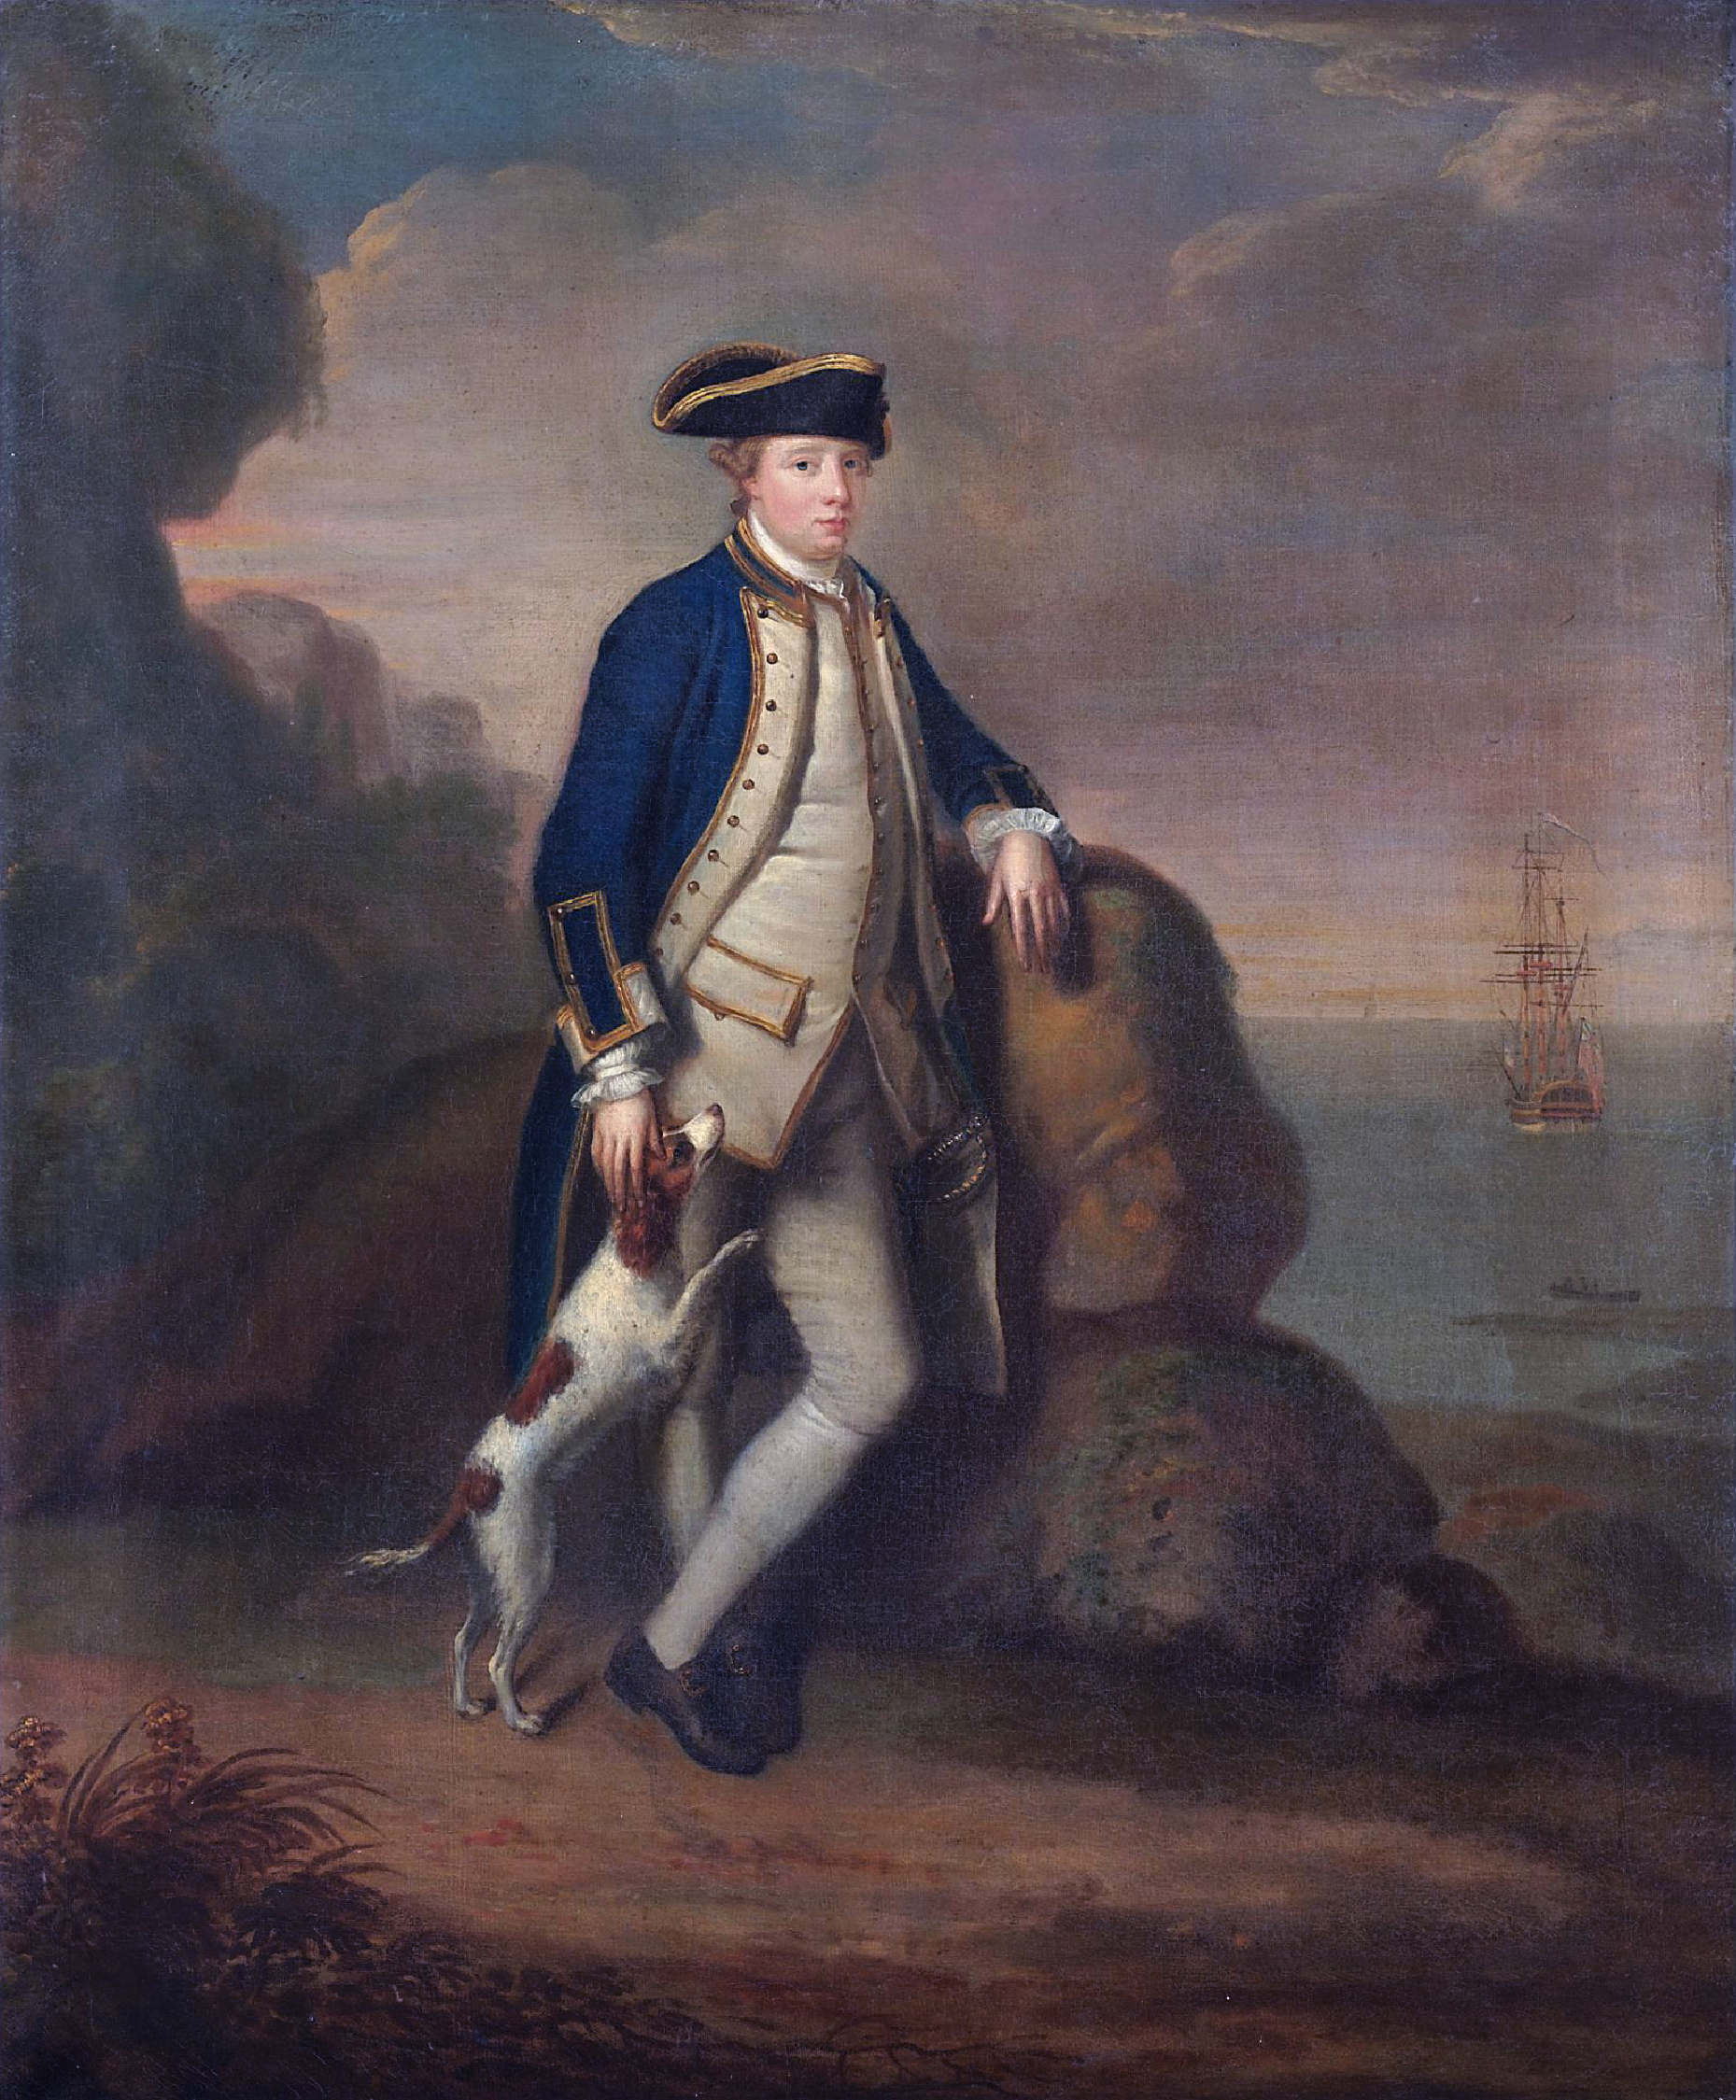 File:Edward Michael Pakenham, 2nd Baron Longford (1743-1792) by Robert